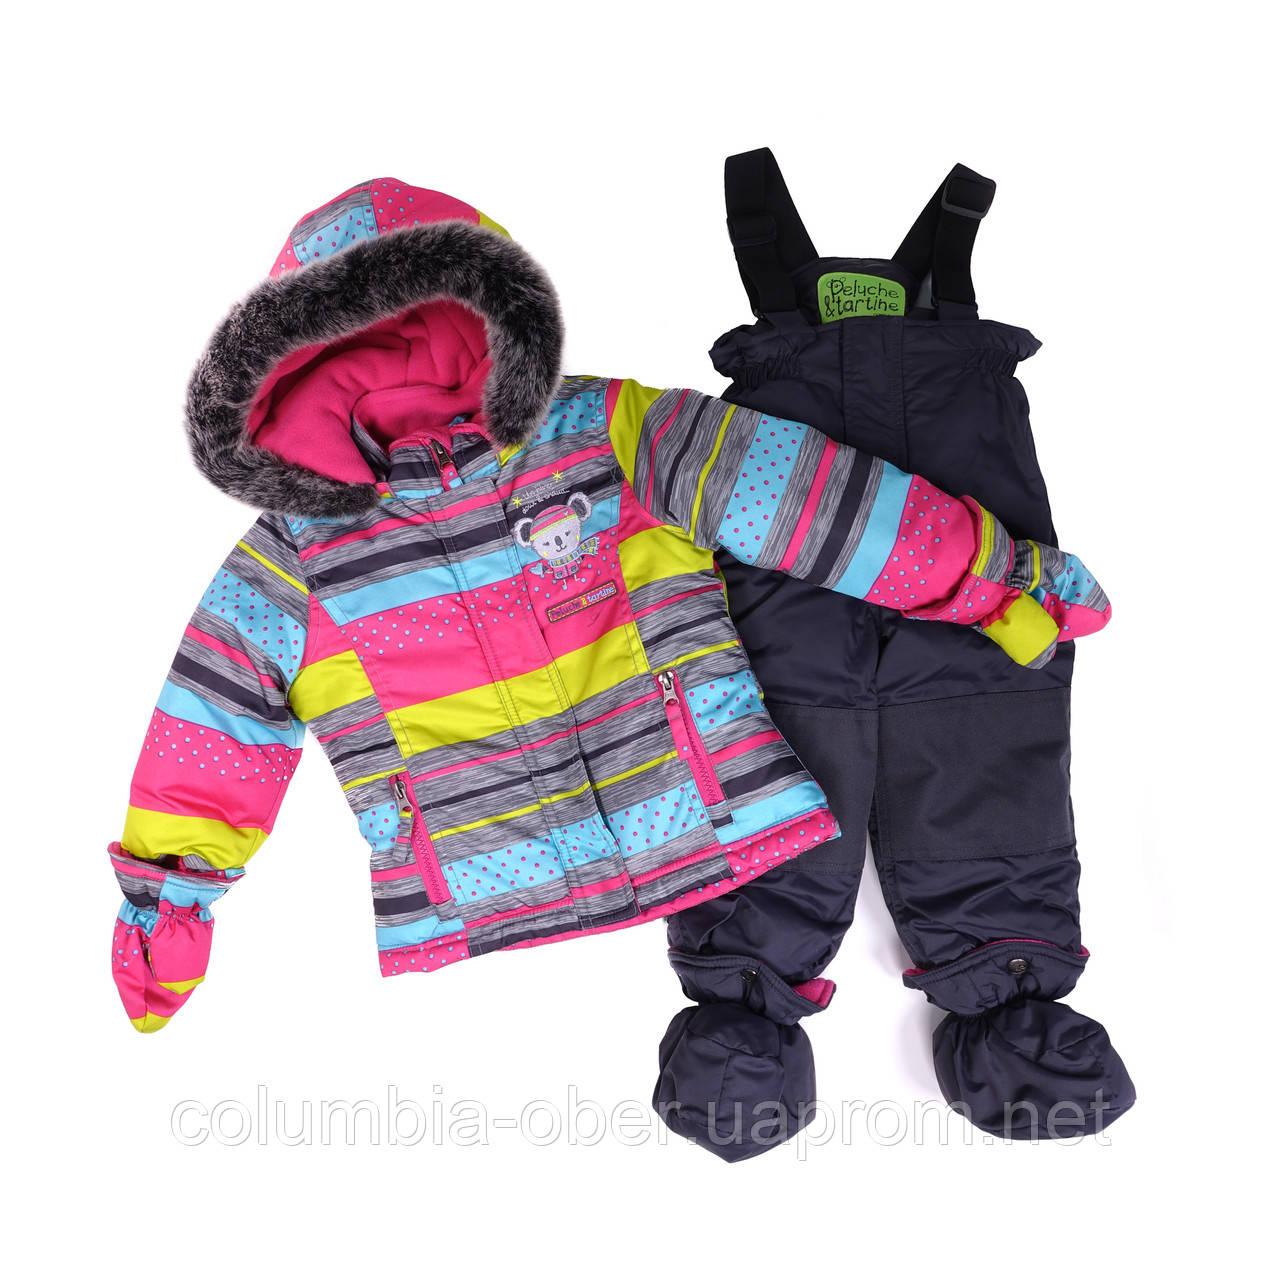 Зимний костюм для девочки PELUCHE 40 BF M F16 Hot Pink. Размеры 75 - 98.